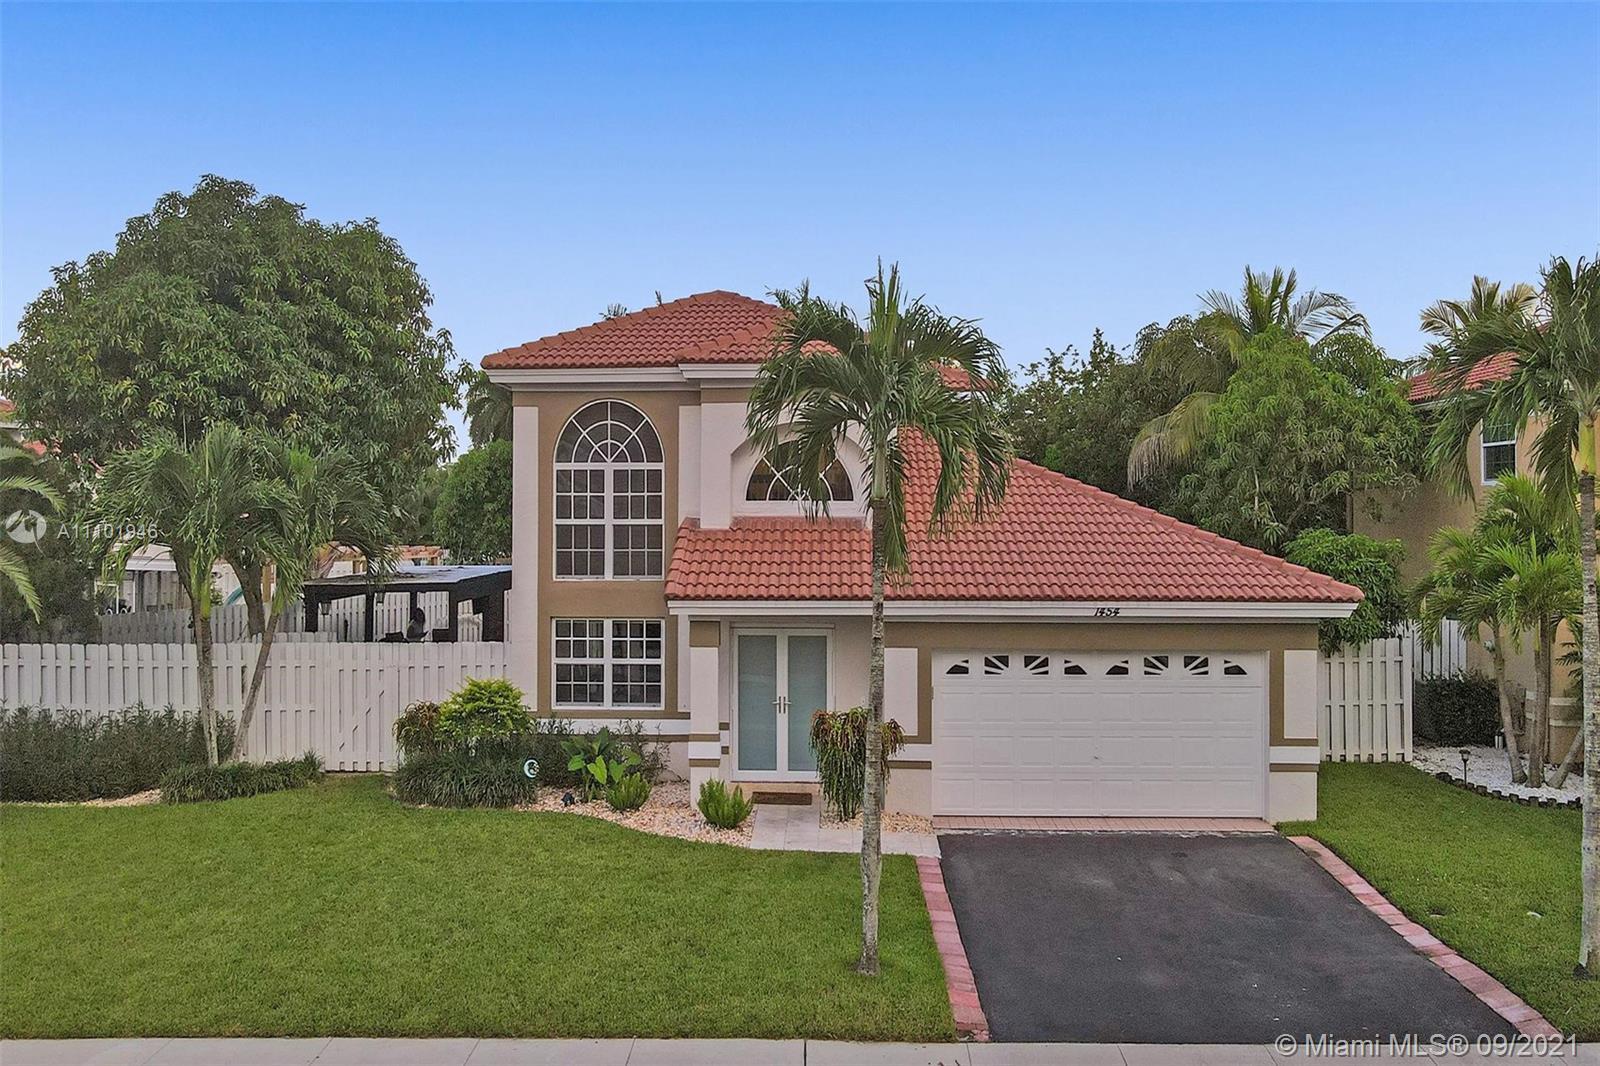 1454 129th Way, Sunrise, Florida 33323